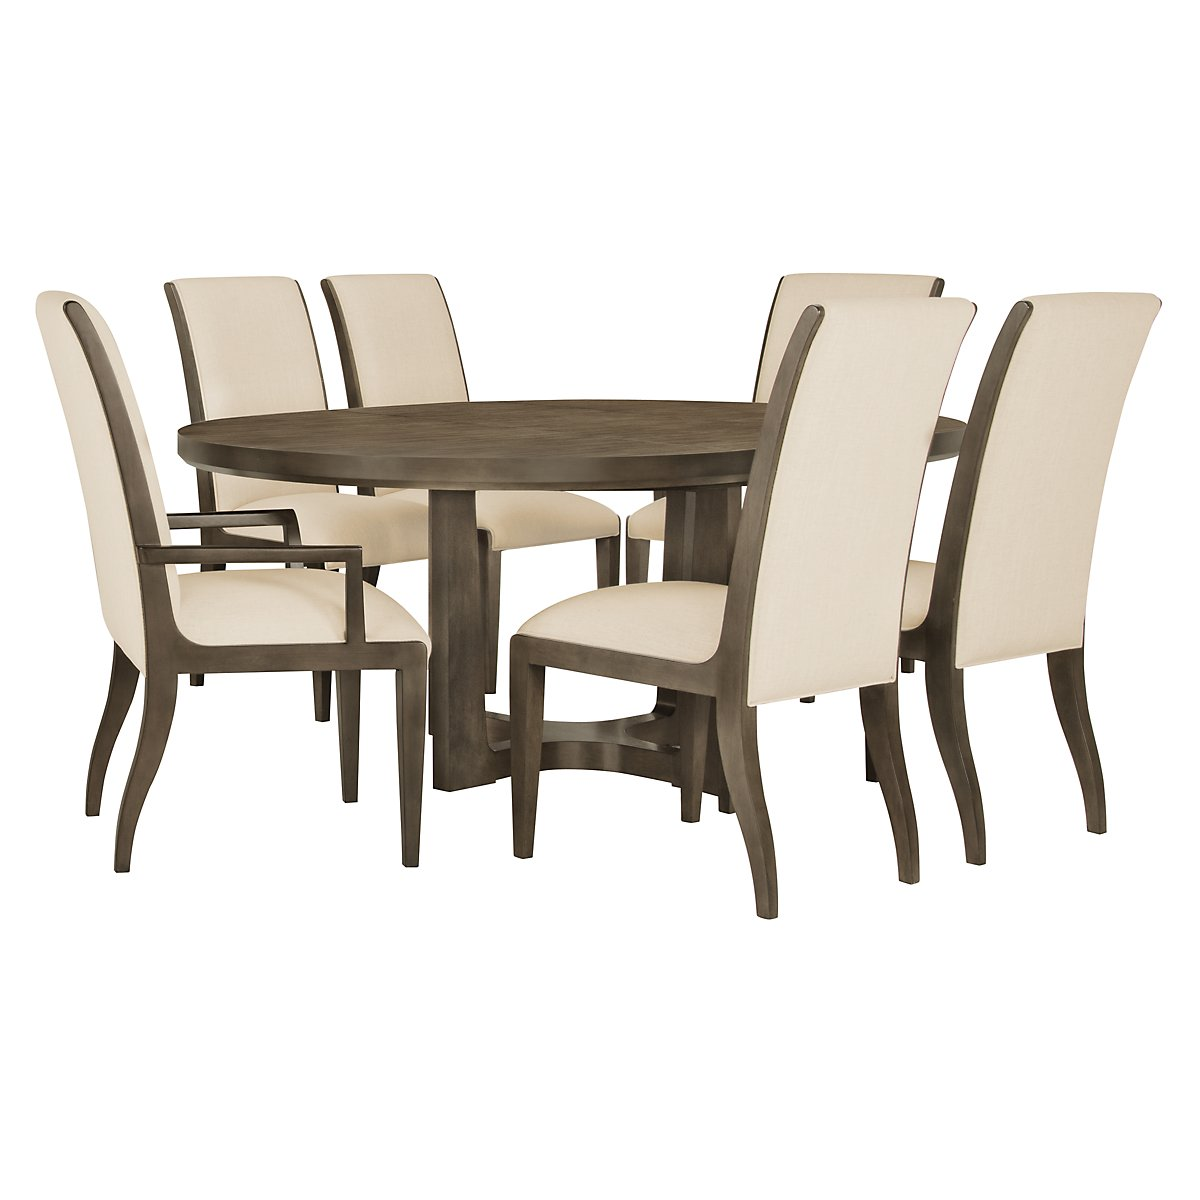 City Furniture Preston Gray Sloped Upholstered Side Chair